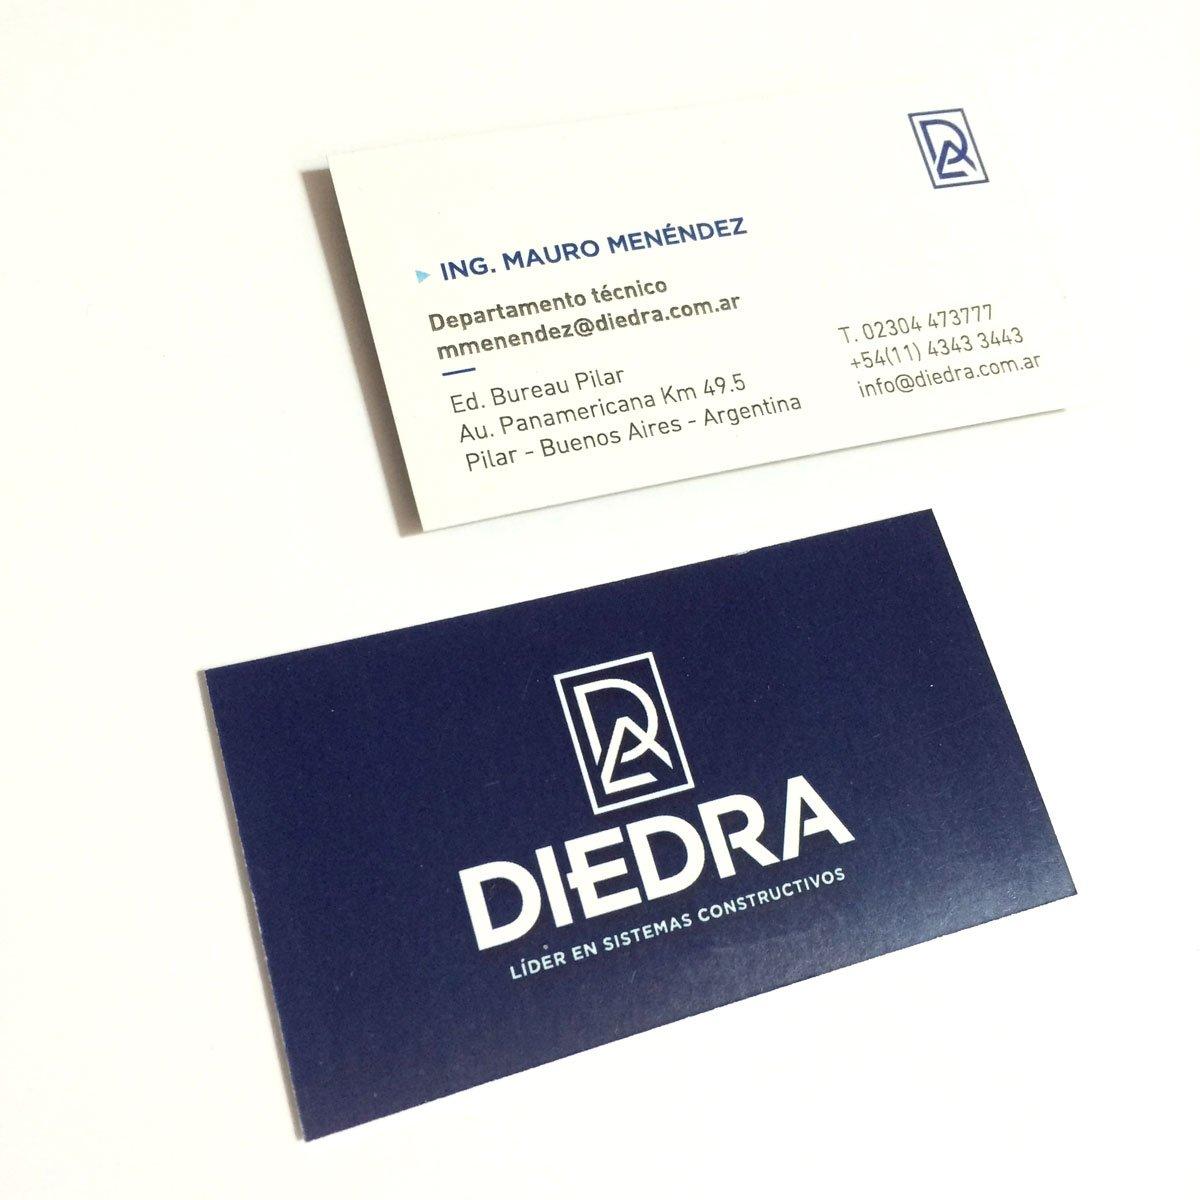 9fd4bba211332 impresion tarjetas ultrarapido · tarjeta personal quinta estacion ·  tarjetas personales en el dia · tarjetas personales impresion rapida ·  tarjetas